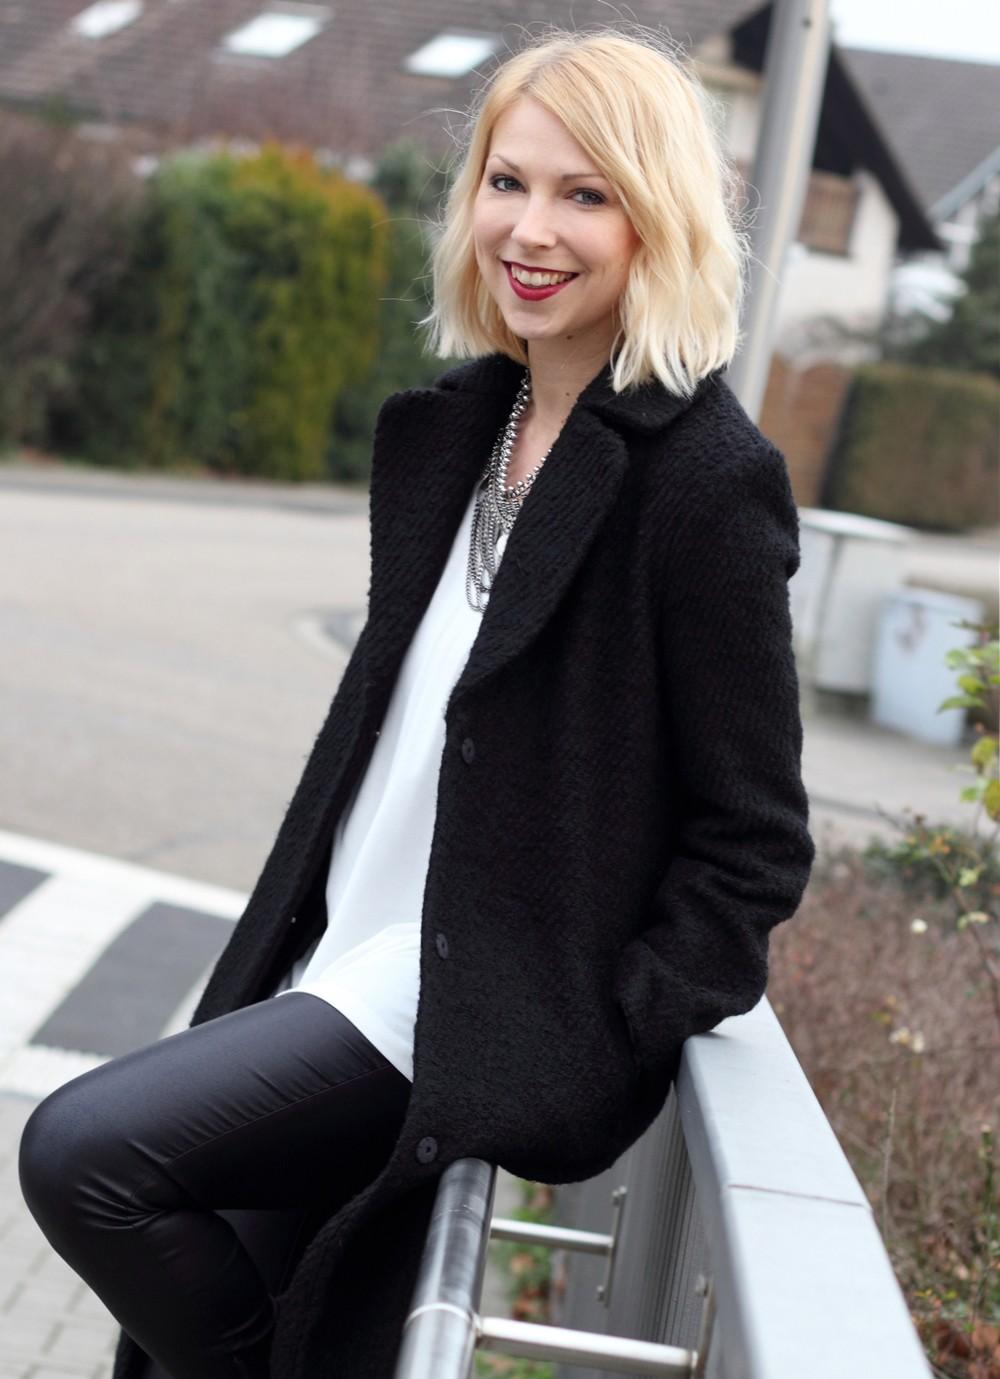 Fashionbloggerin Karlsruhe Outfit Lederhosen Sneaker Sweater langer Mantel 6